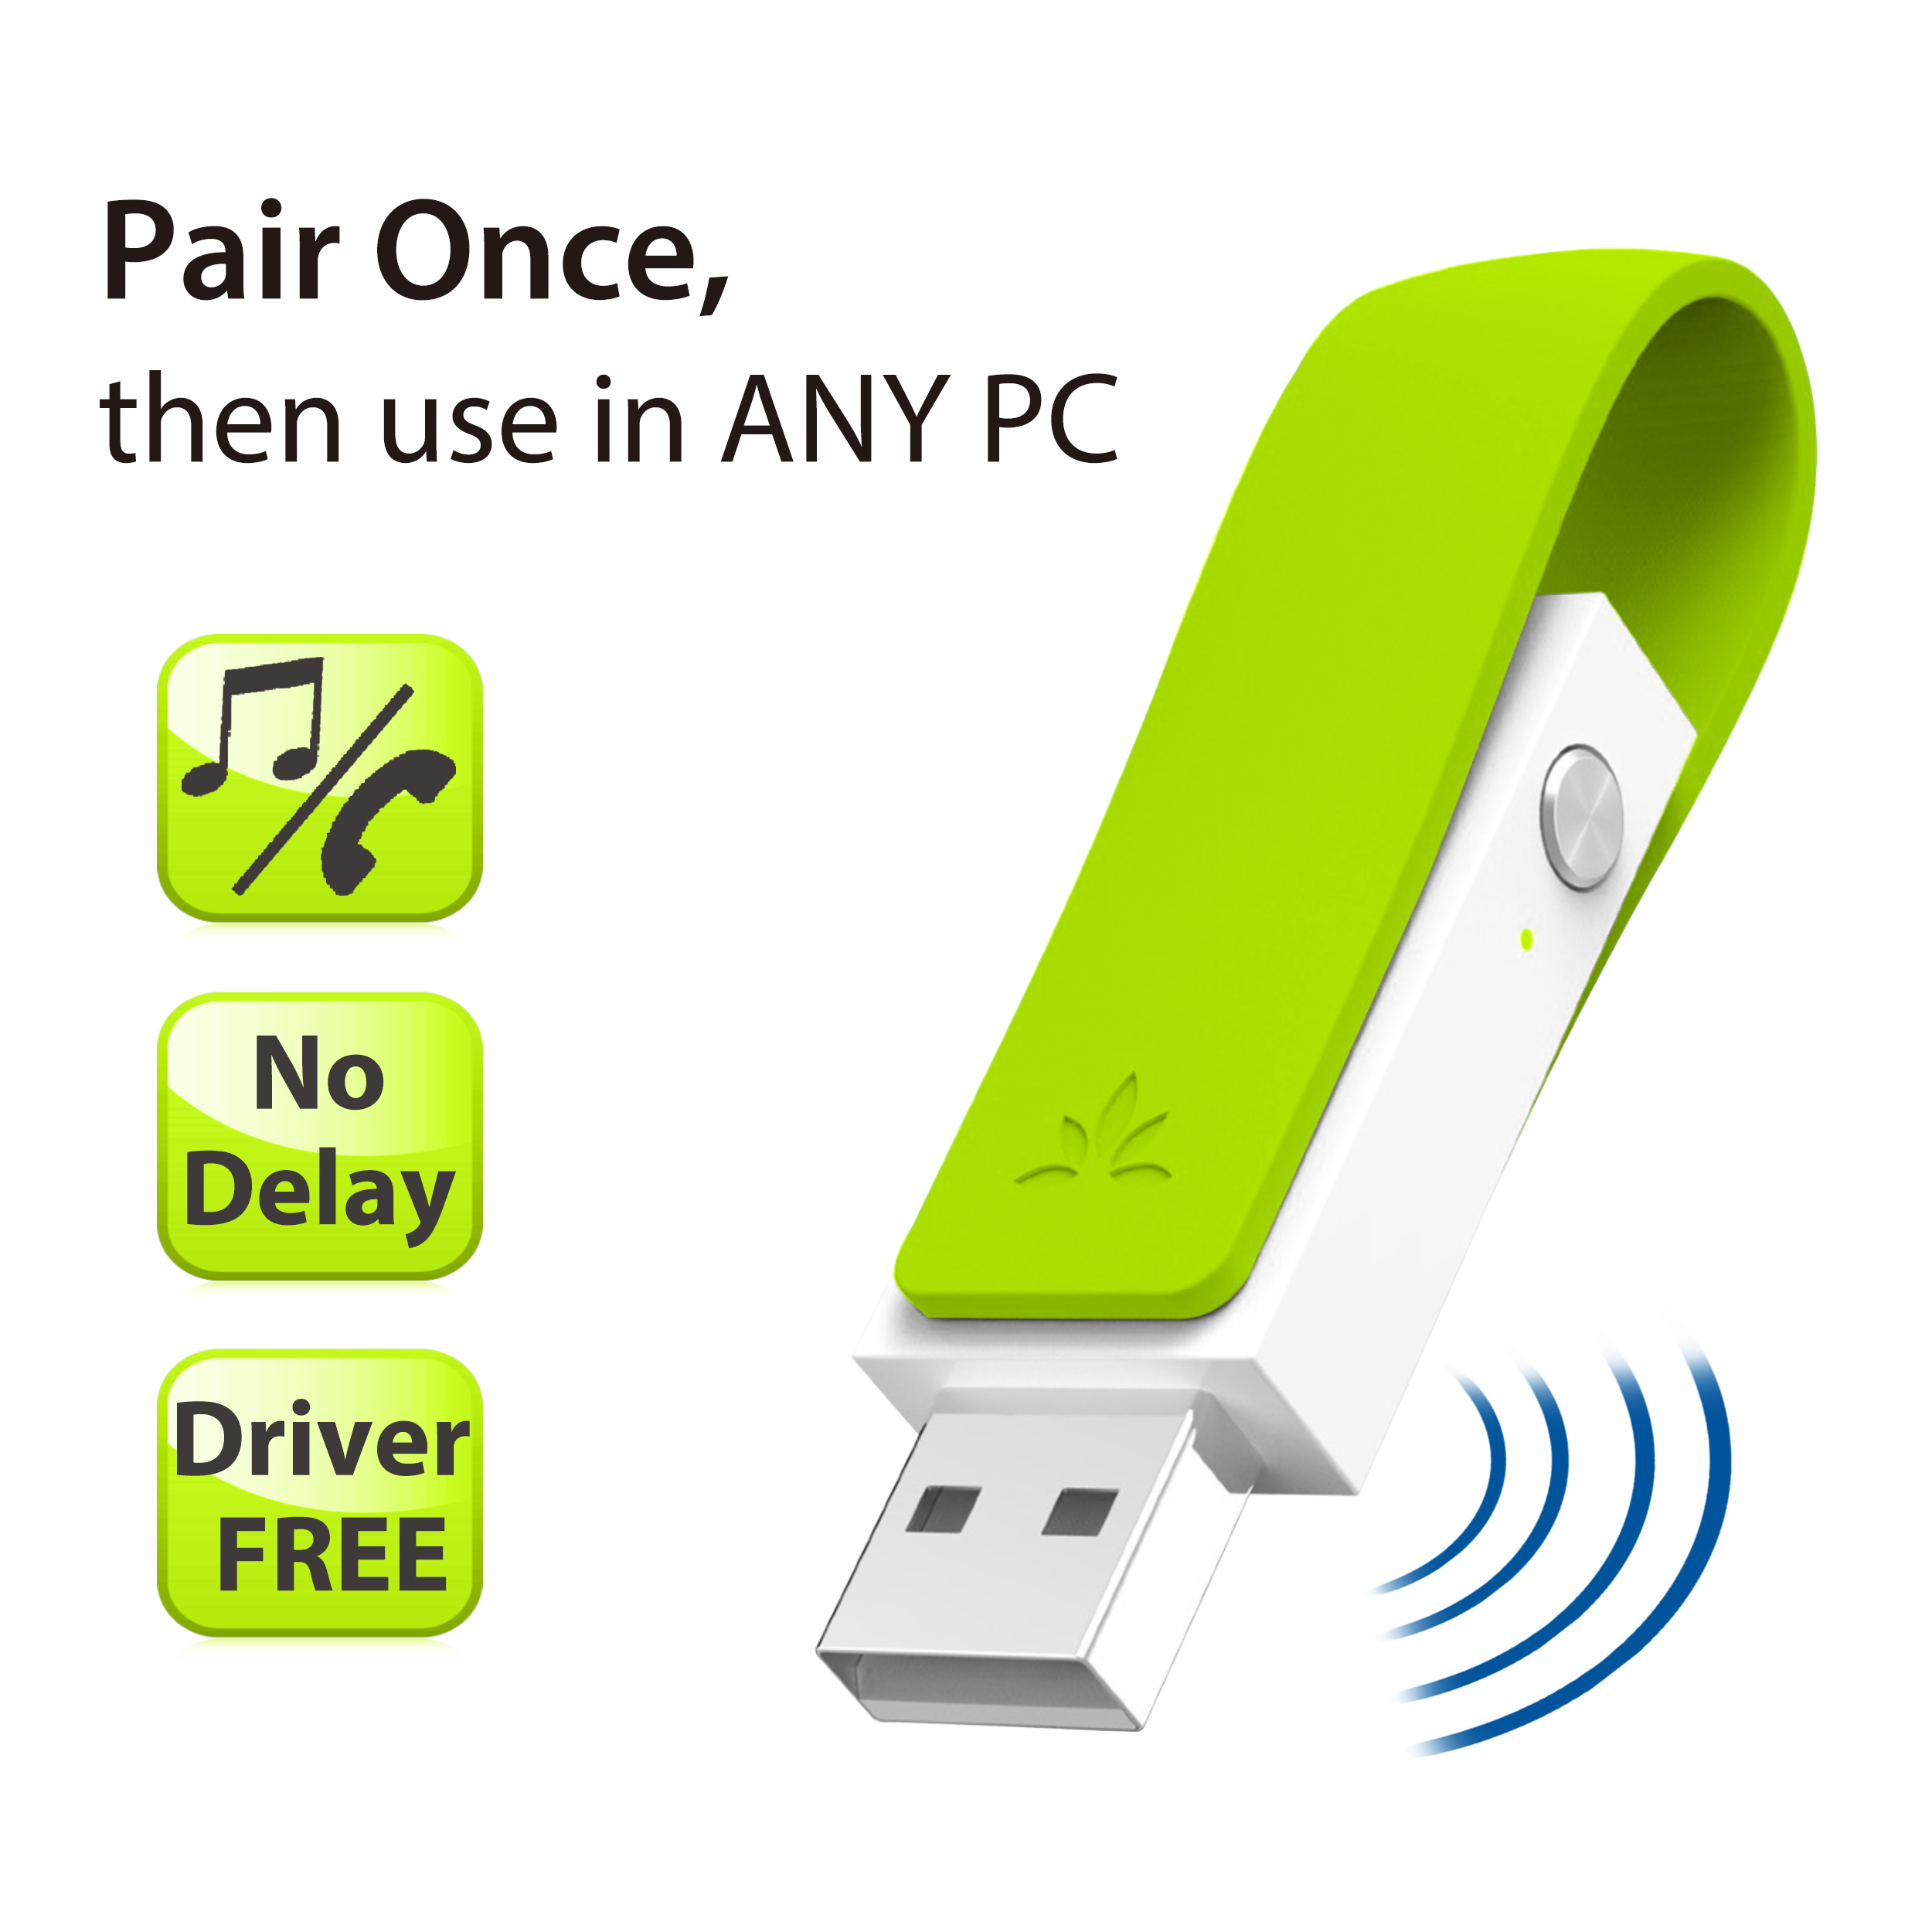 avantree leaf dg50 - Avantree aptX Low Latency LONG RANGE Bluetooth 4.1 Adapter for PC, Driver-Free Wireless USB Audio Dongle Transmitter for PS4